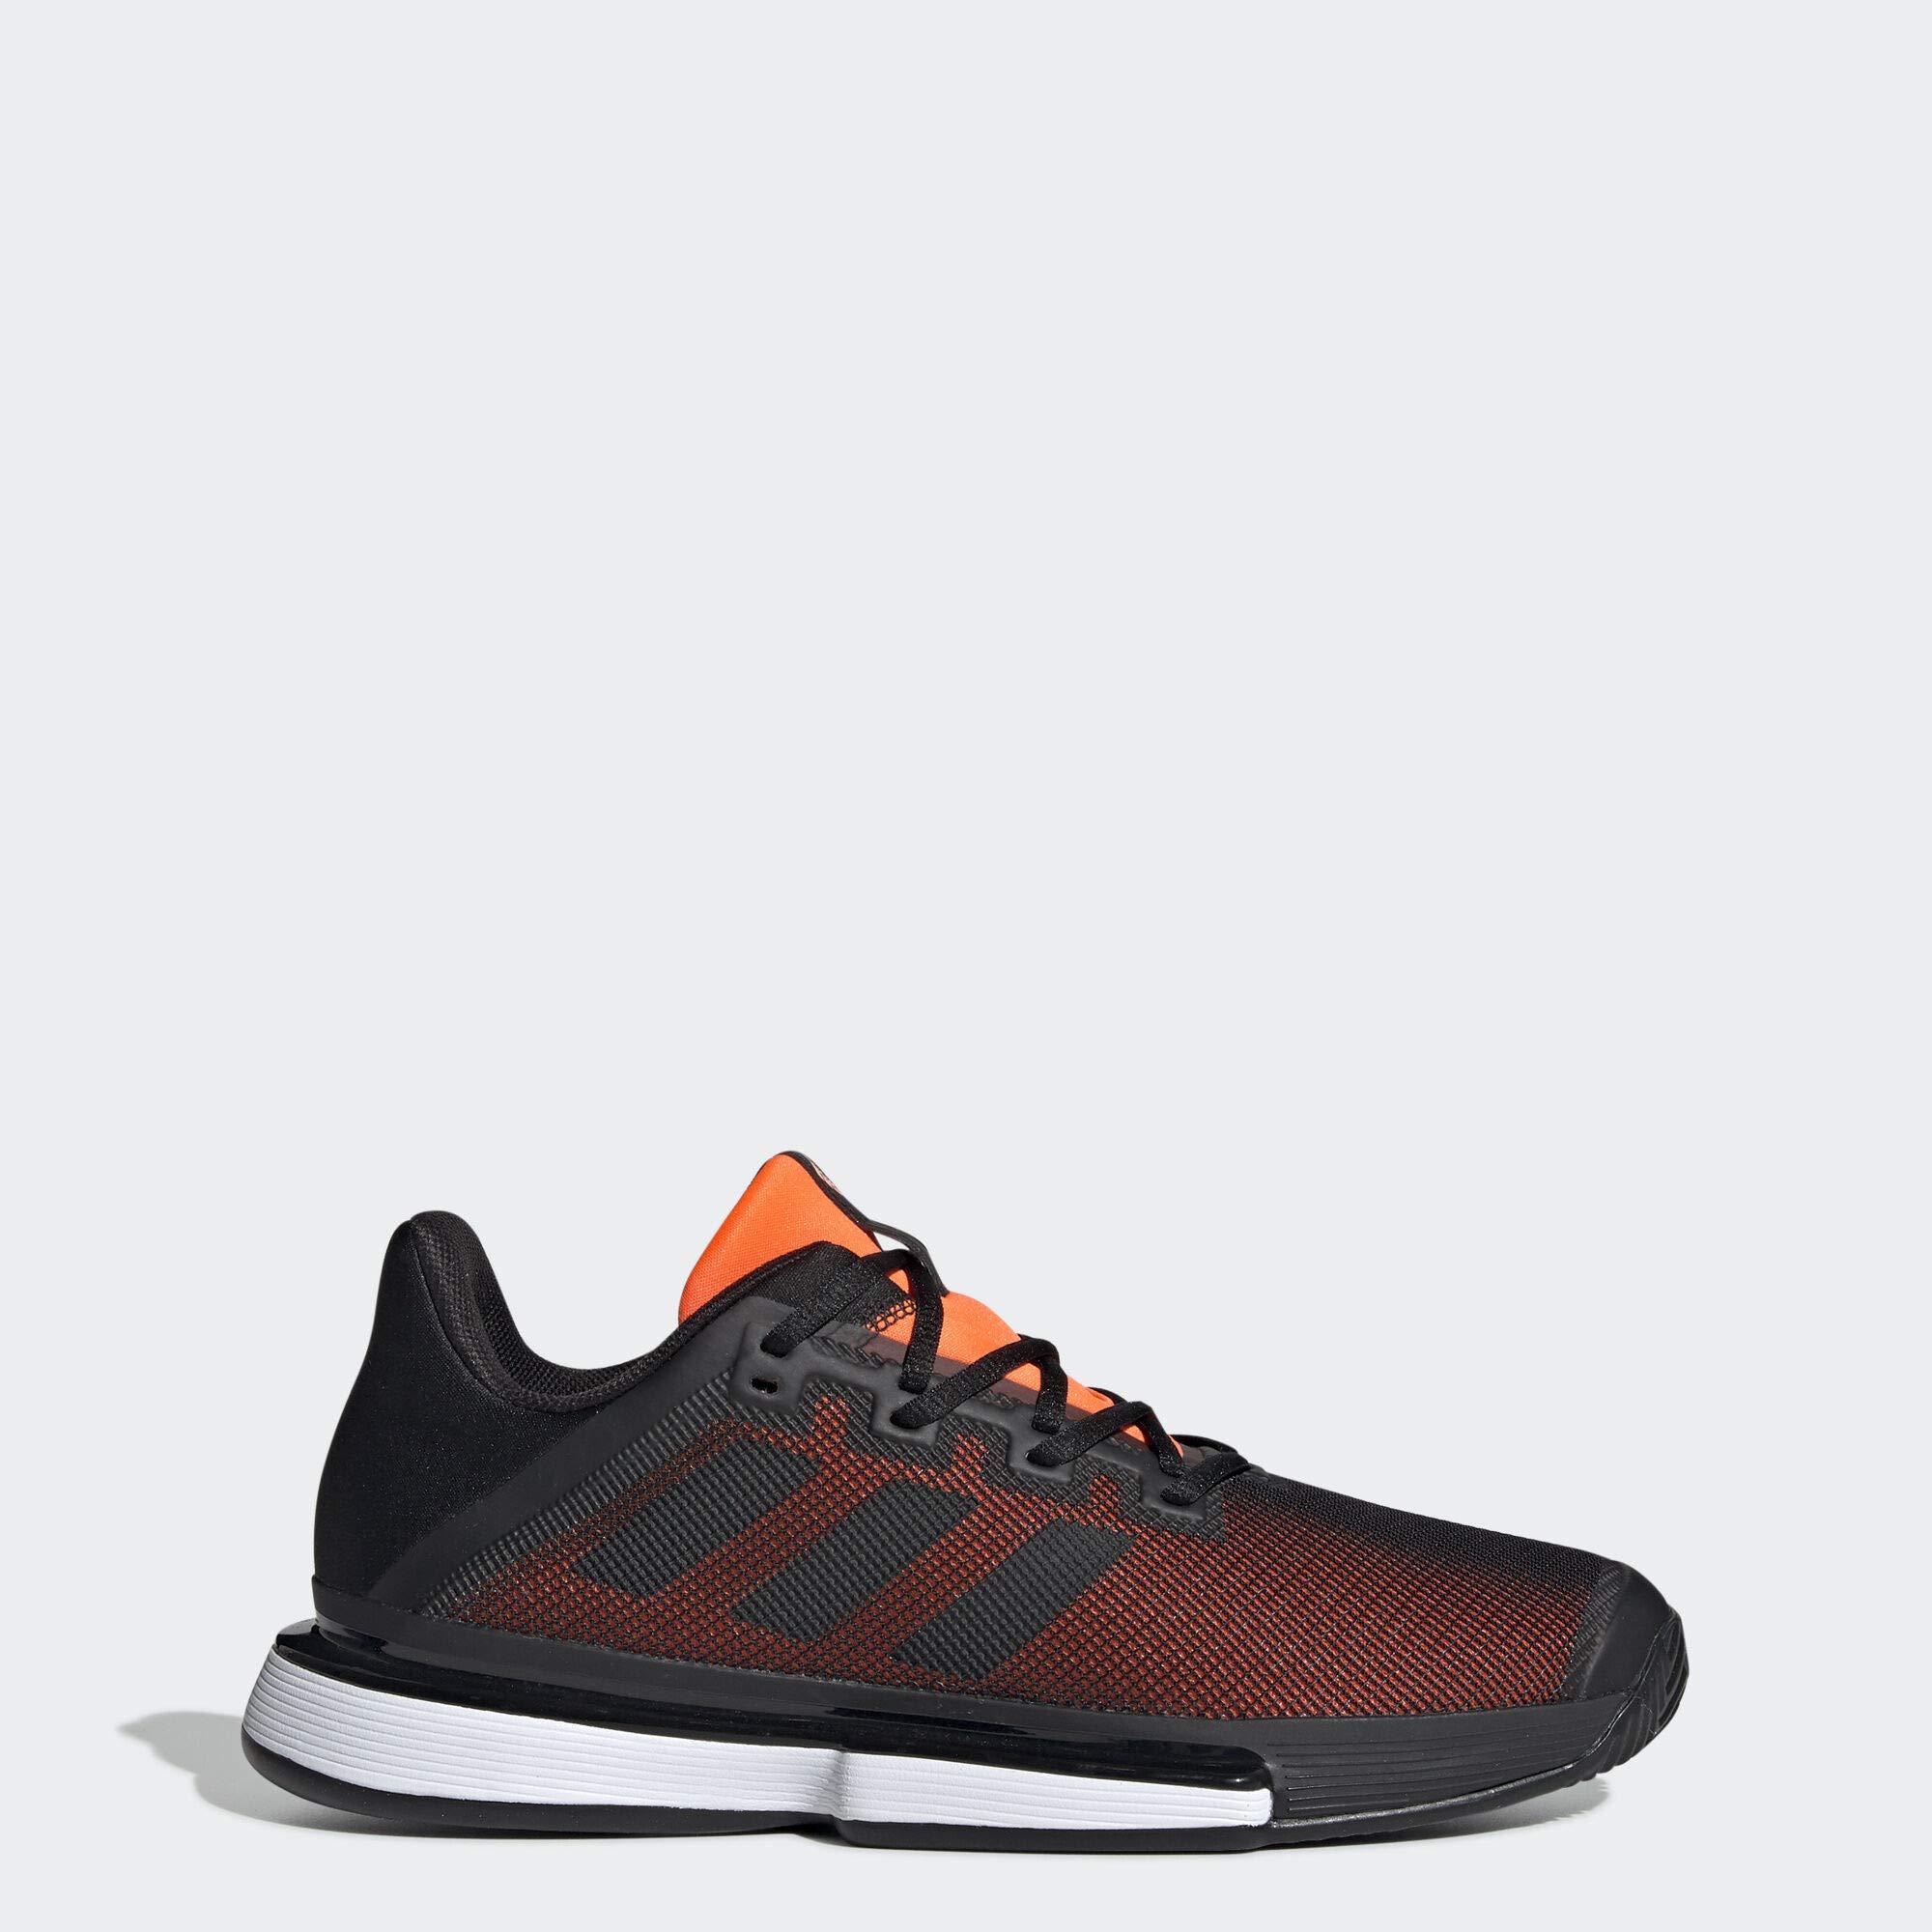 adidas Men's SoleMatch Bounce Tennis Shoe, Black/Solar Orange, 9.5 M US by adidas